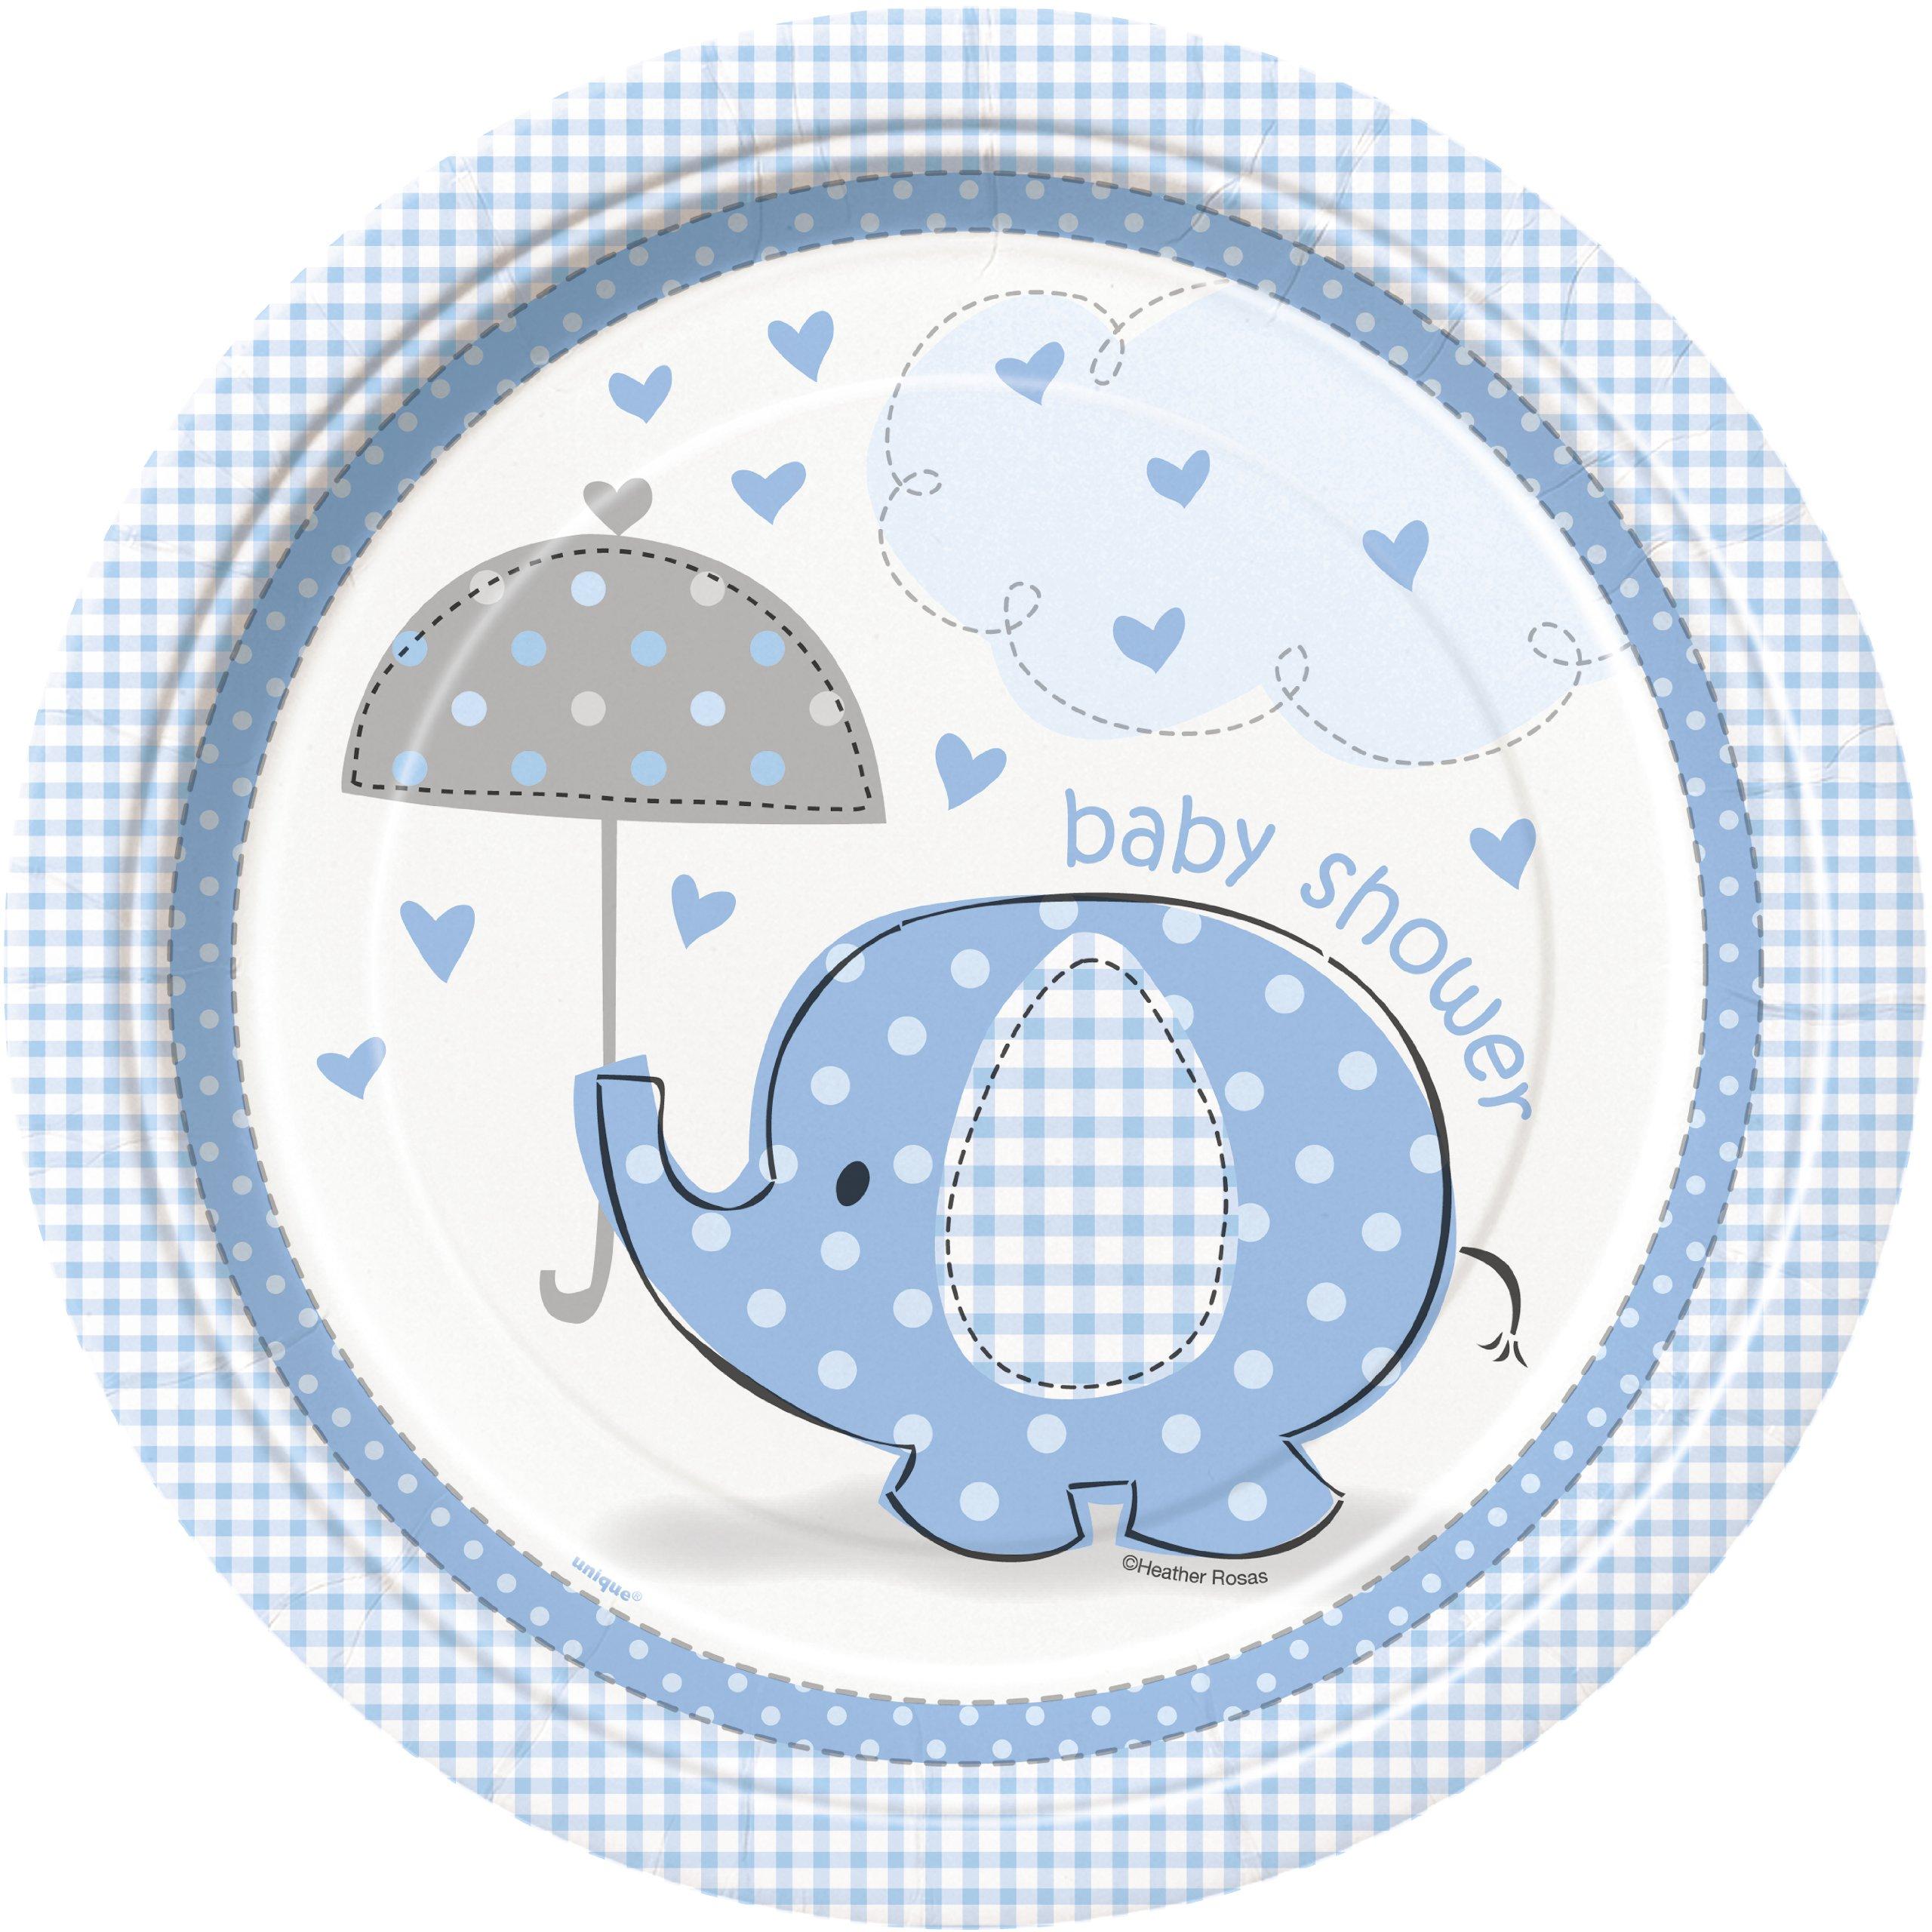 Blue Elephant Boy Baby Shower Dinner Plates, 8ct